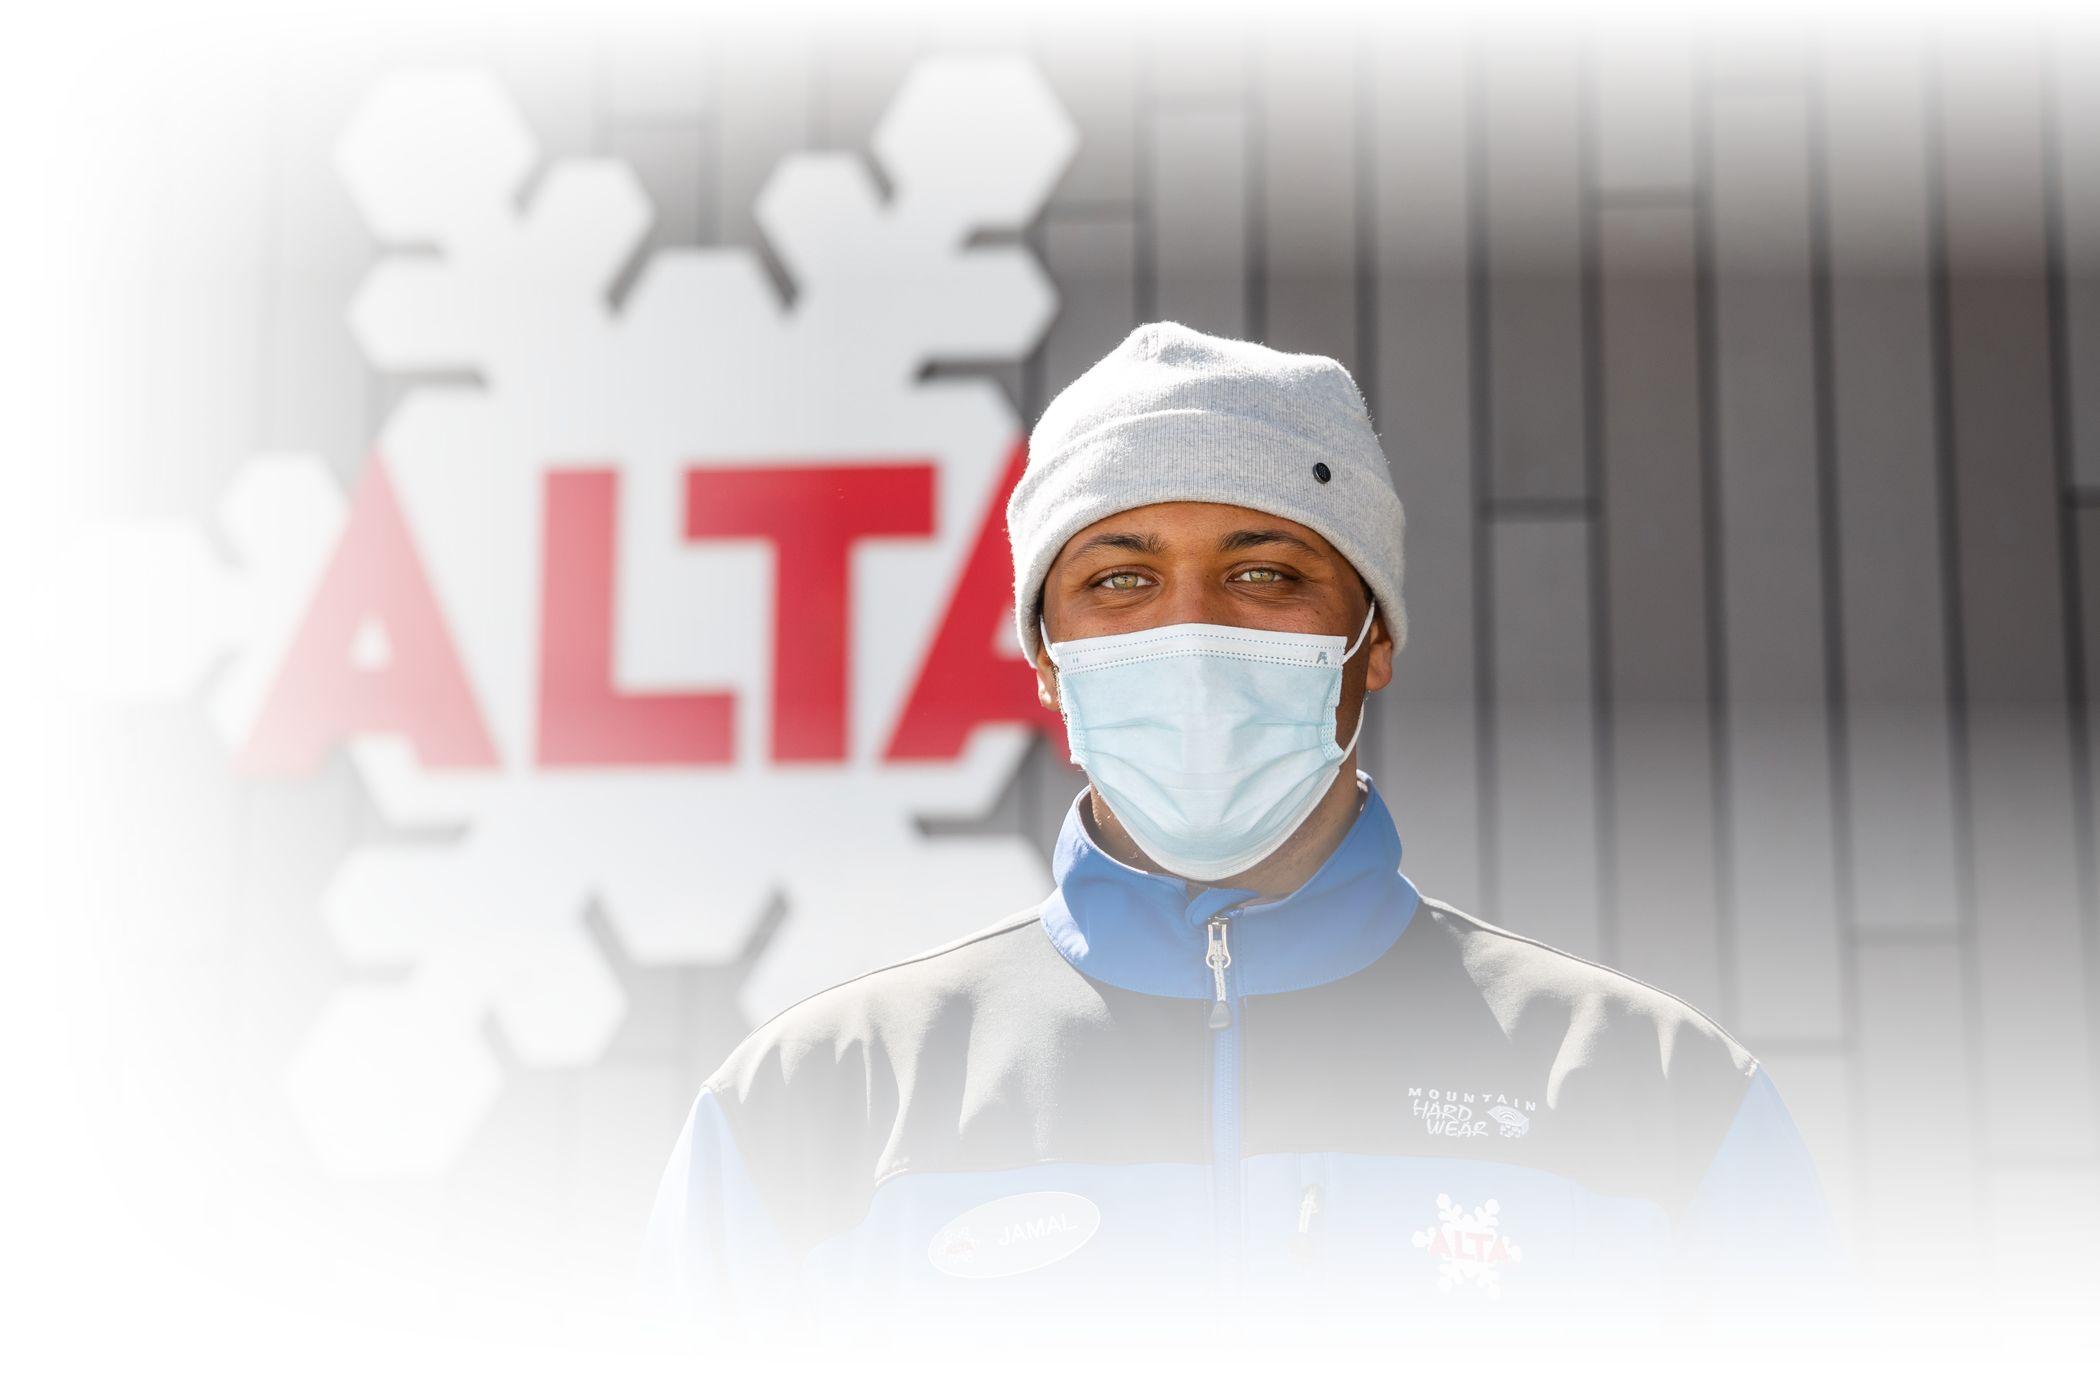 Employees wearing masks at Alta Ski Area